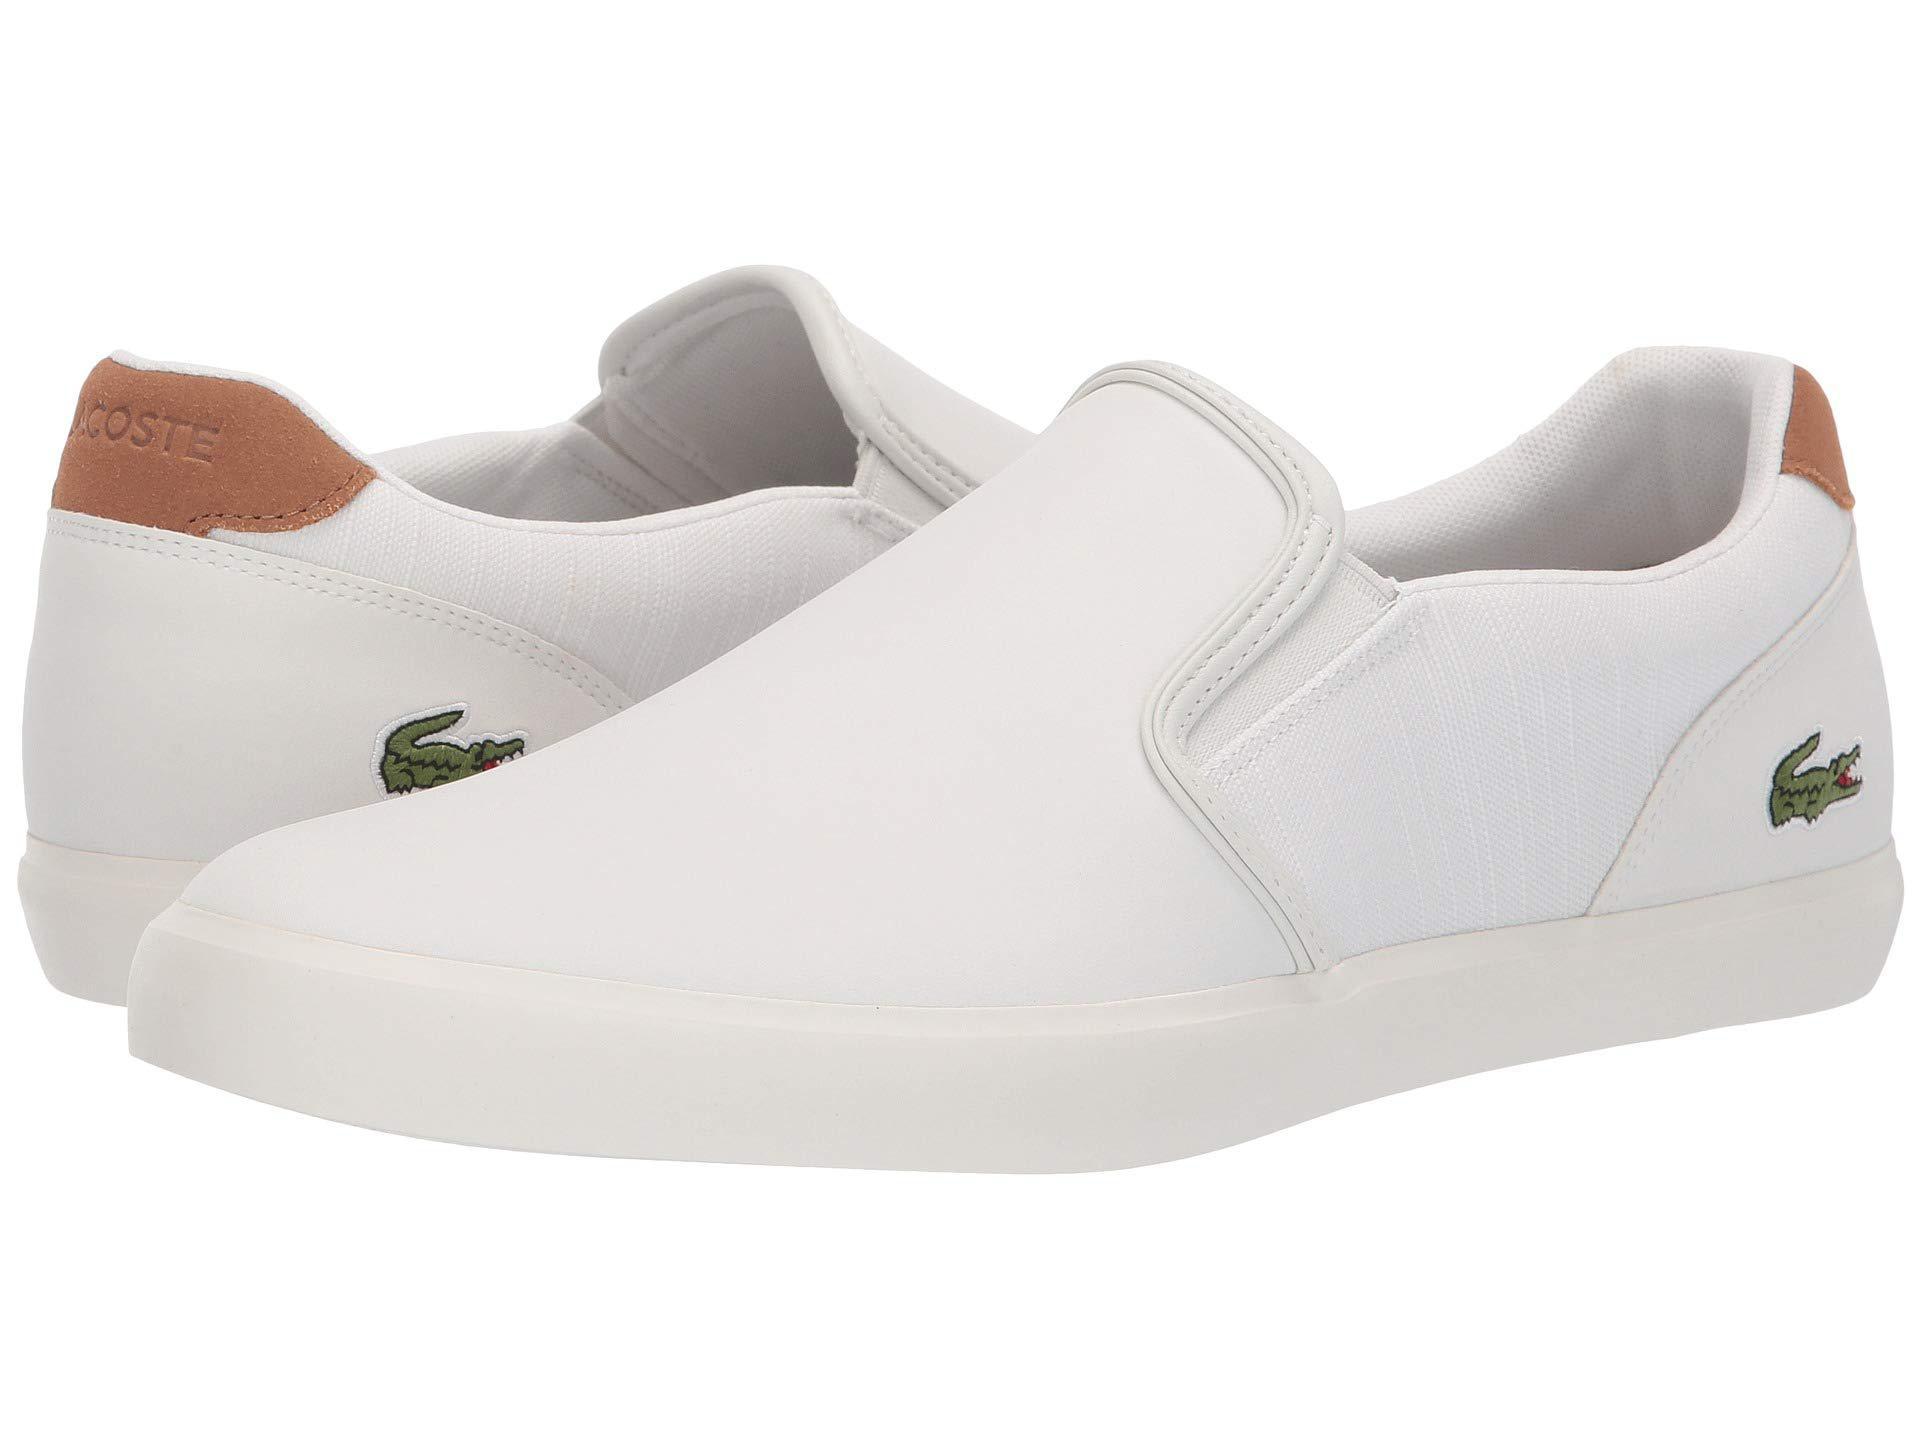 dec8e2174 Lacoste - Jouer Slip 119 2 (off-white light Brown) Men s Shoes. View  fullscreen